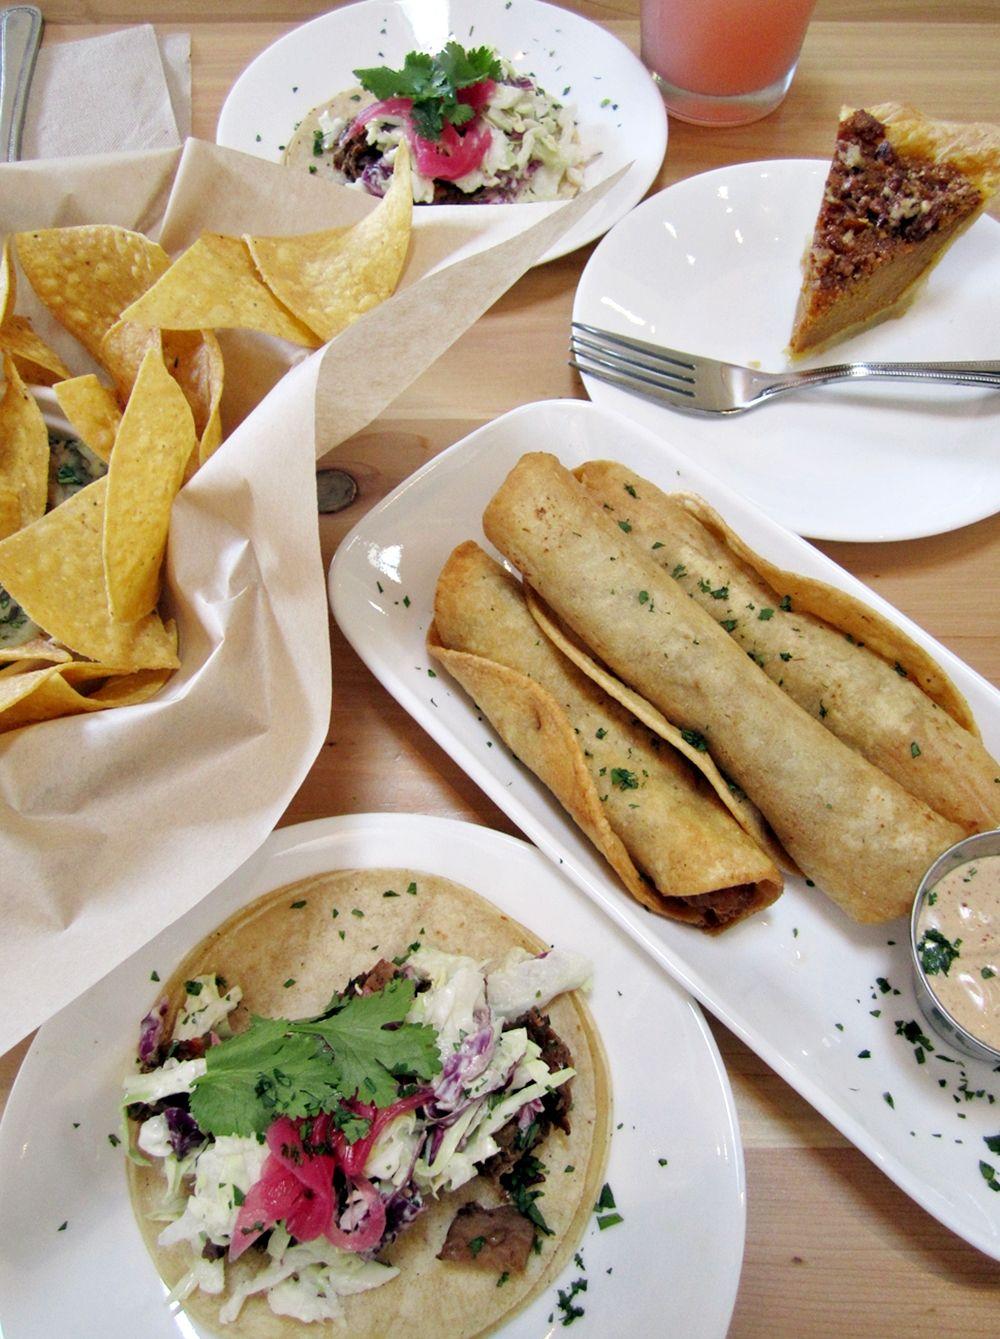 Vegan Eats At Seabirds Kitchen In Costa Mesa Ca Food